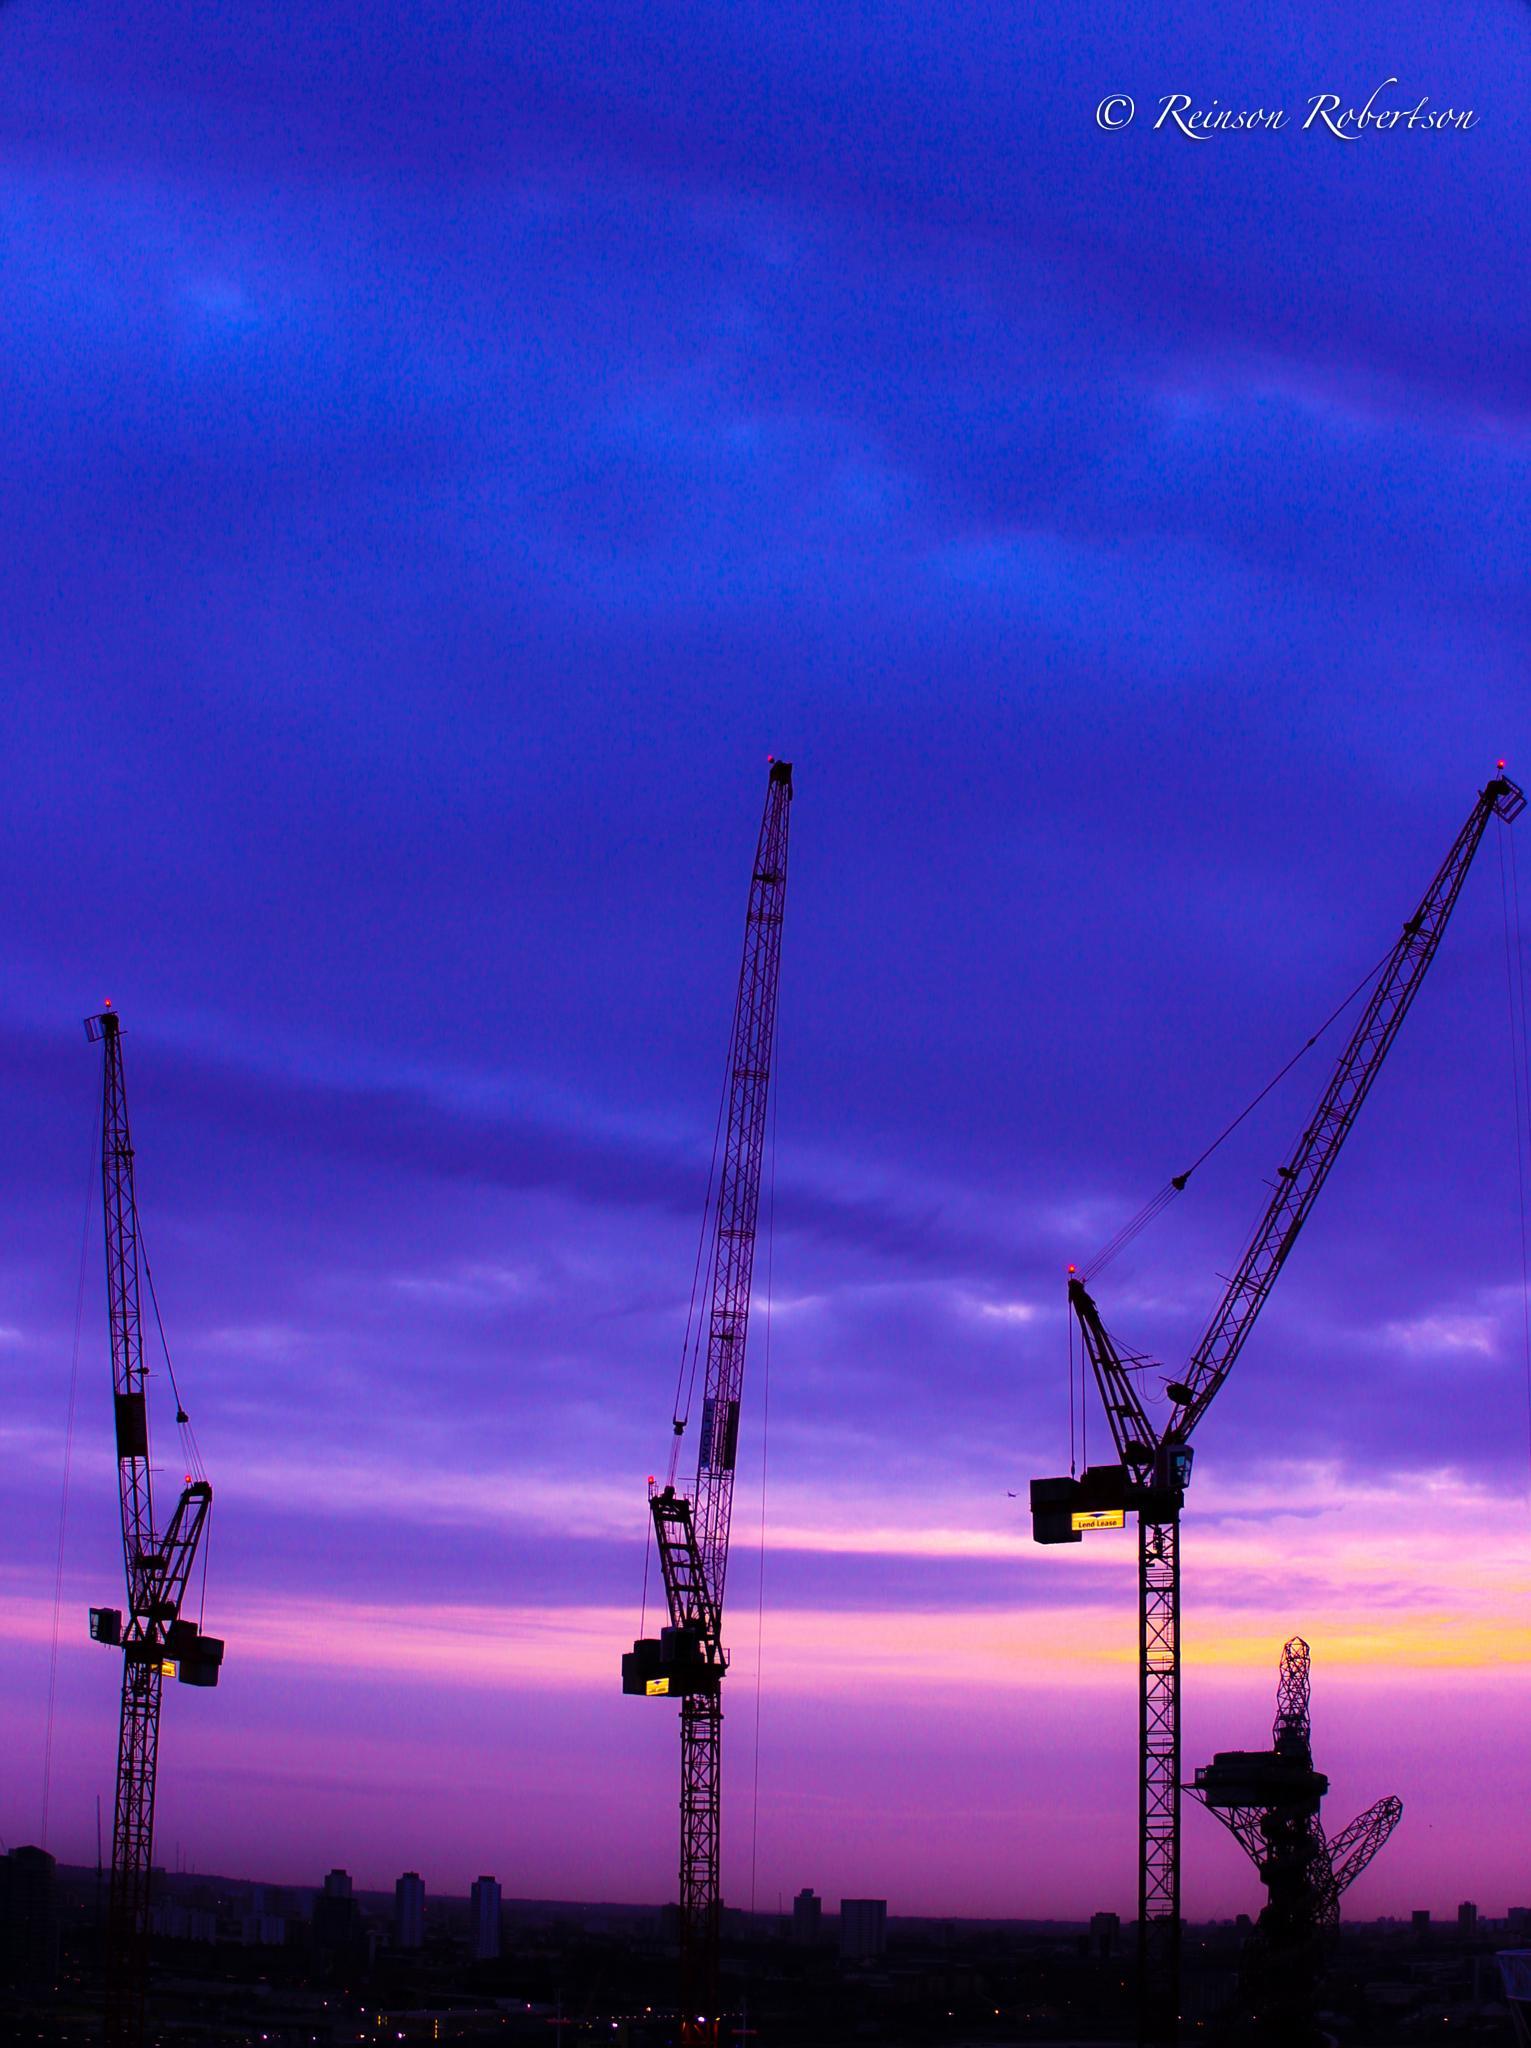 LONDON CRANES & THE ARCELORMITTAL ORBIT by Reinson Robertson